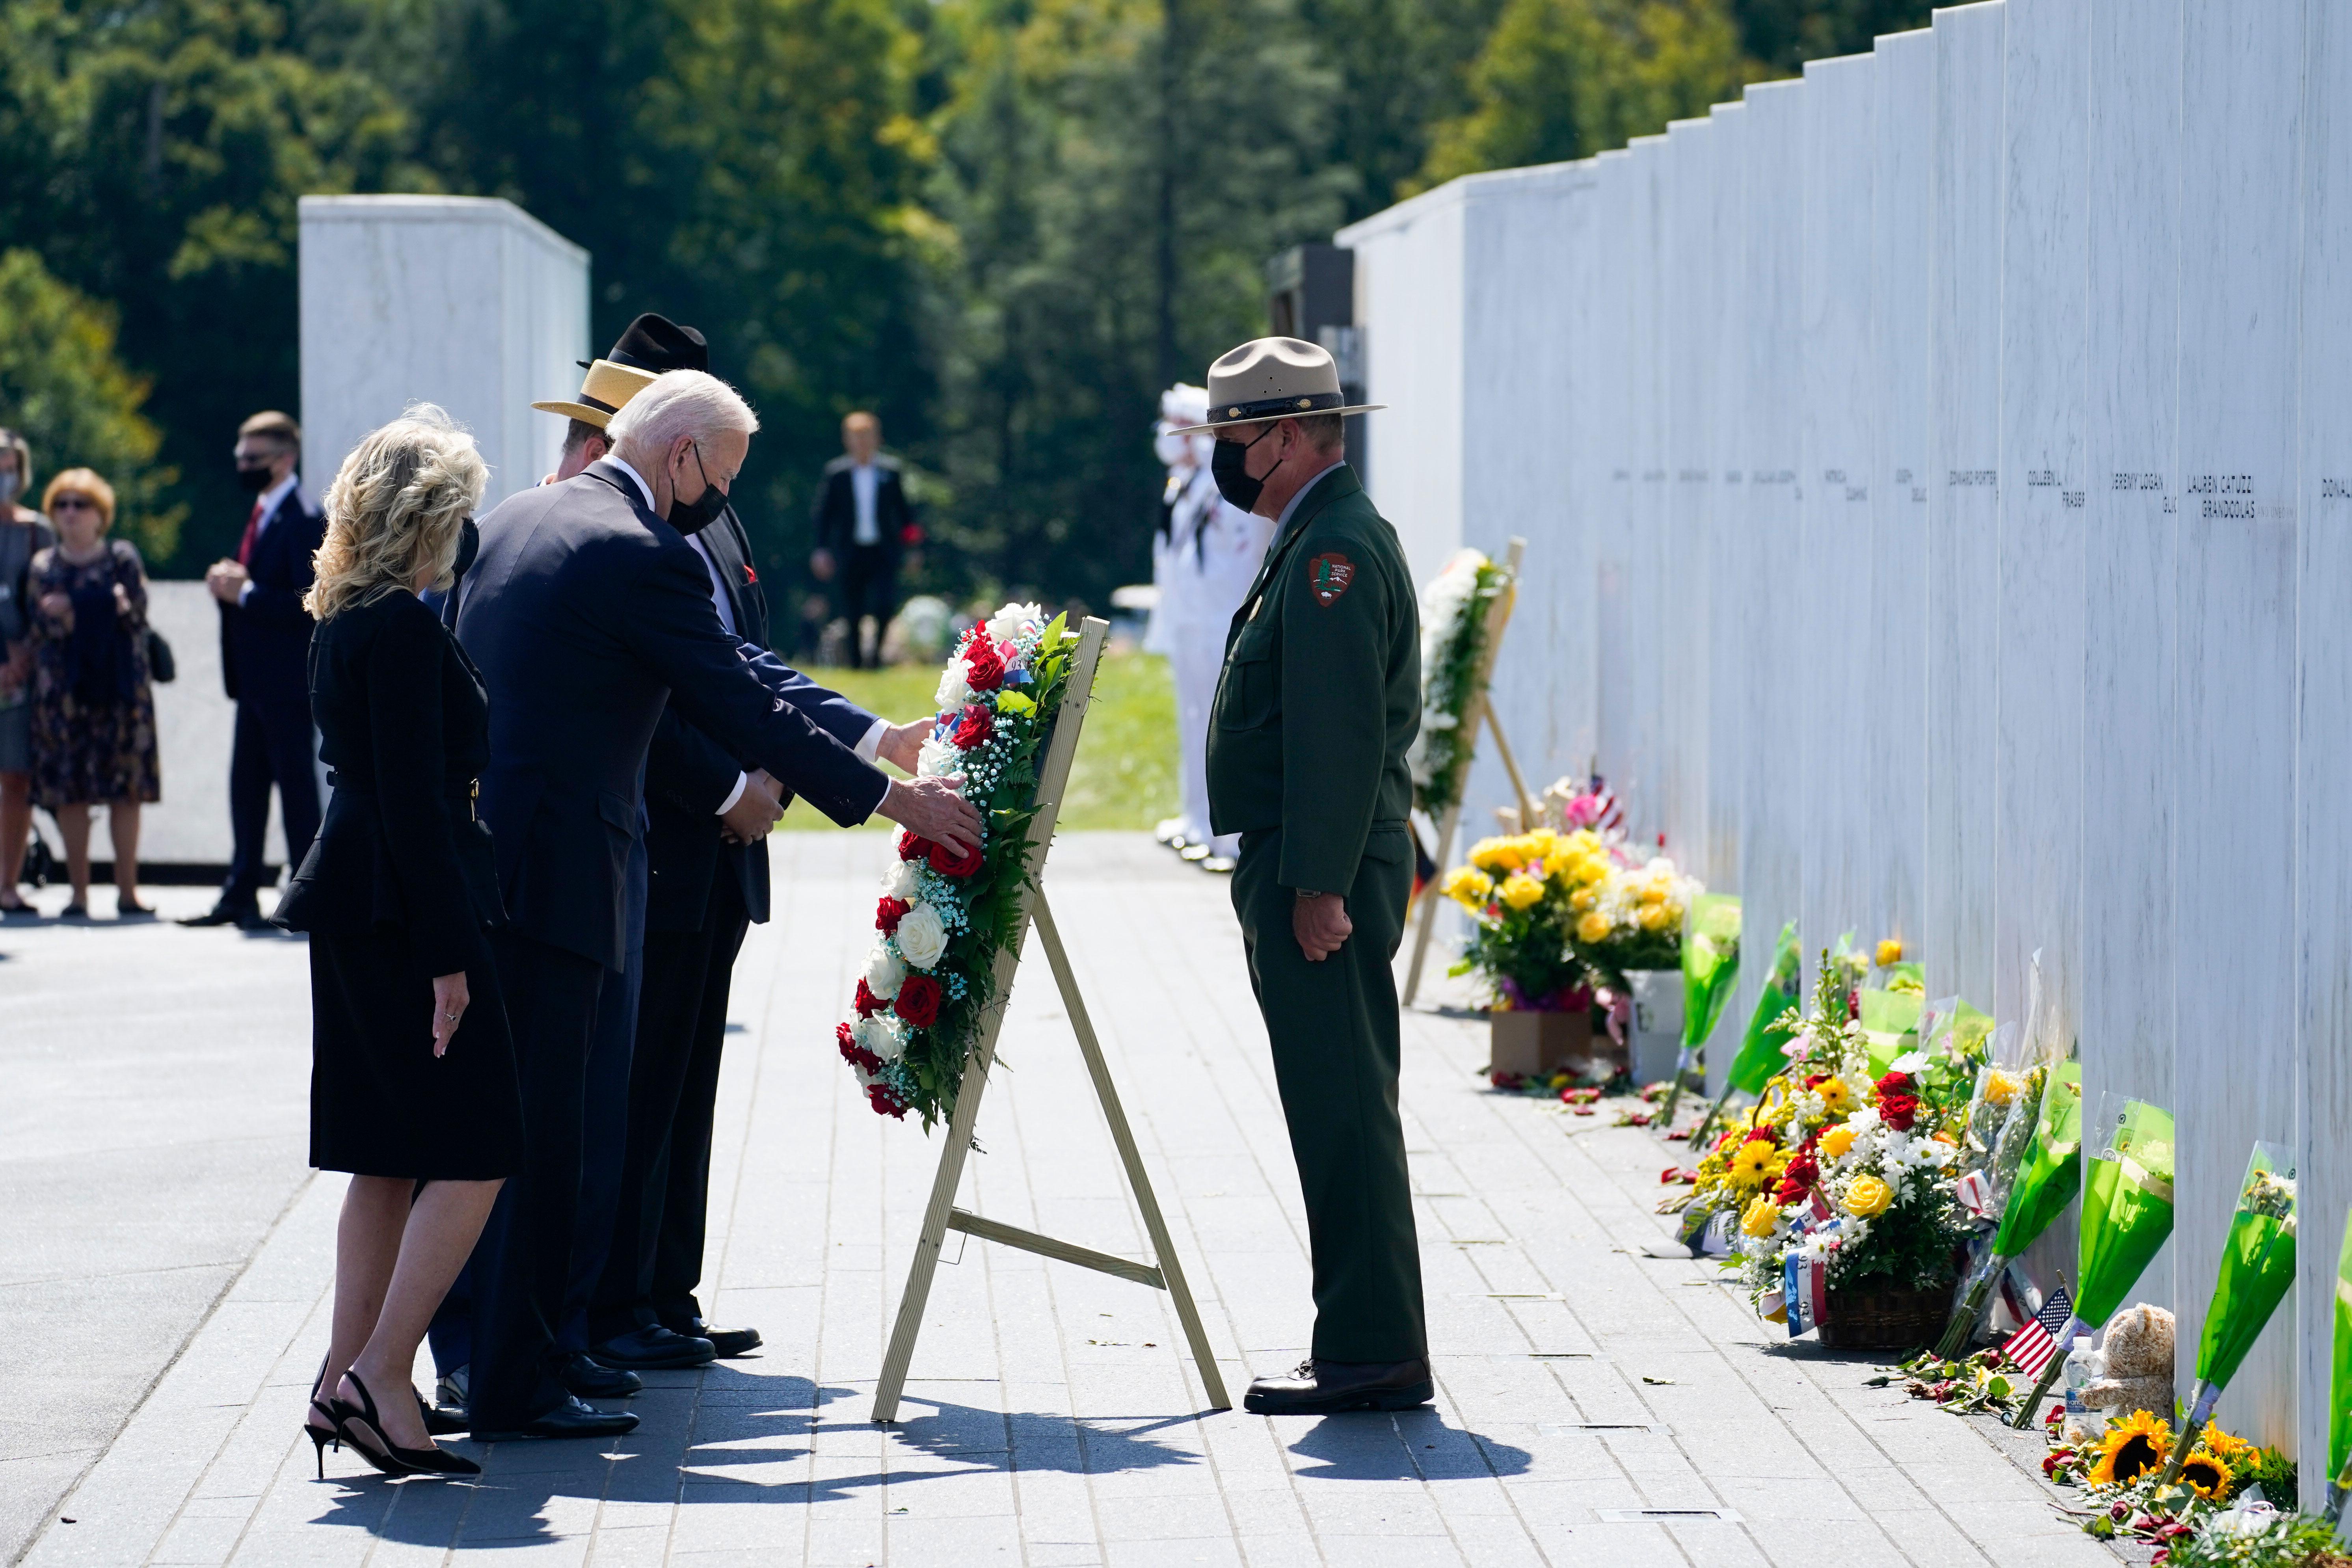 President Joe Biden and first lady Jill Biden lay a wreath at the Flight 93 National Memorial in Shanksville, Pennsylvania, on September 11.